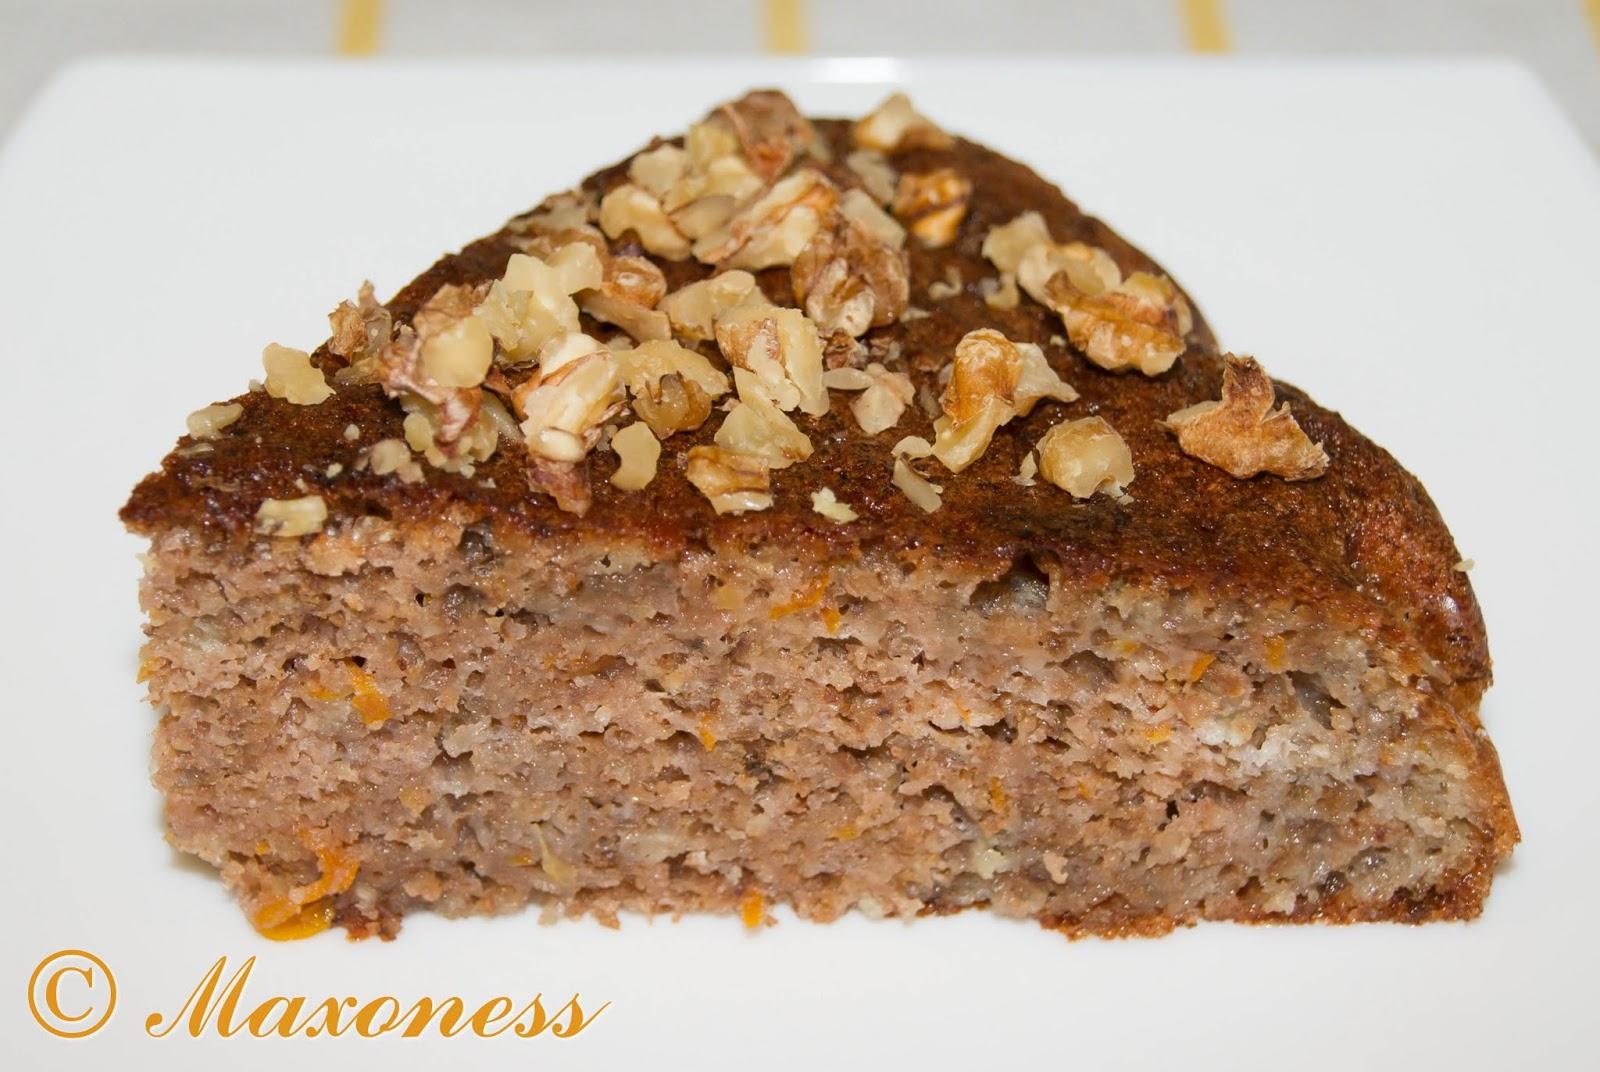 Пирог с грецкими орехами от Гордона Рамзи. Греческая кухня.